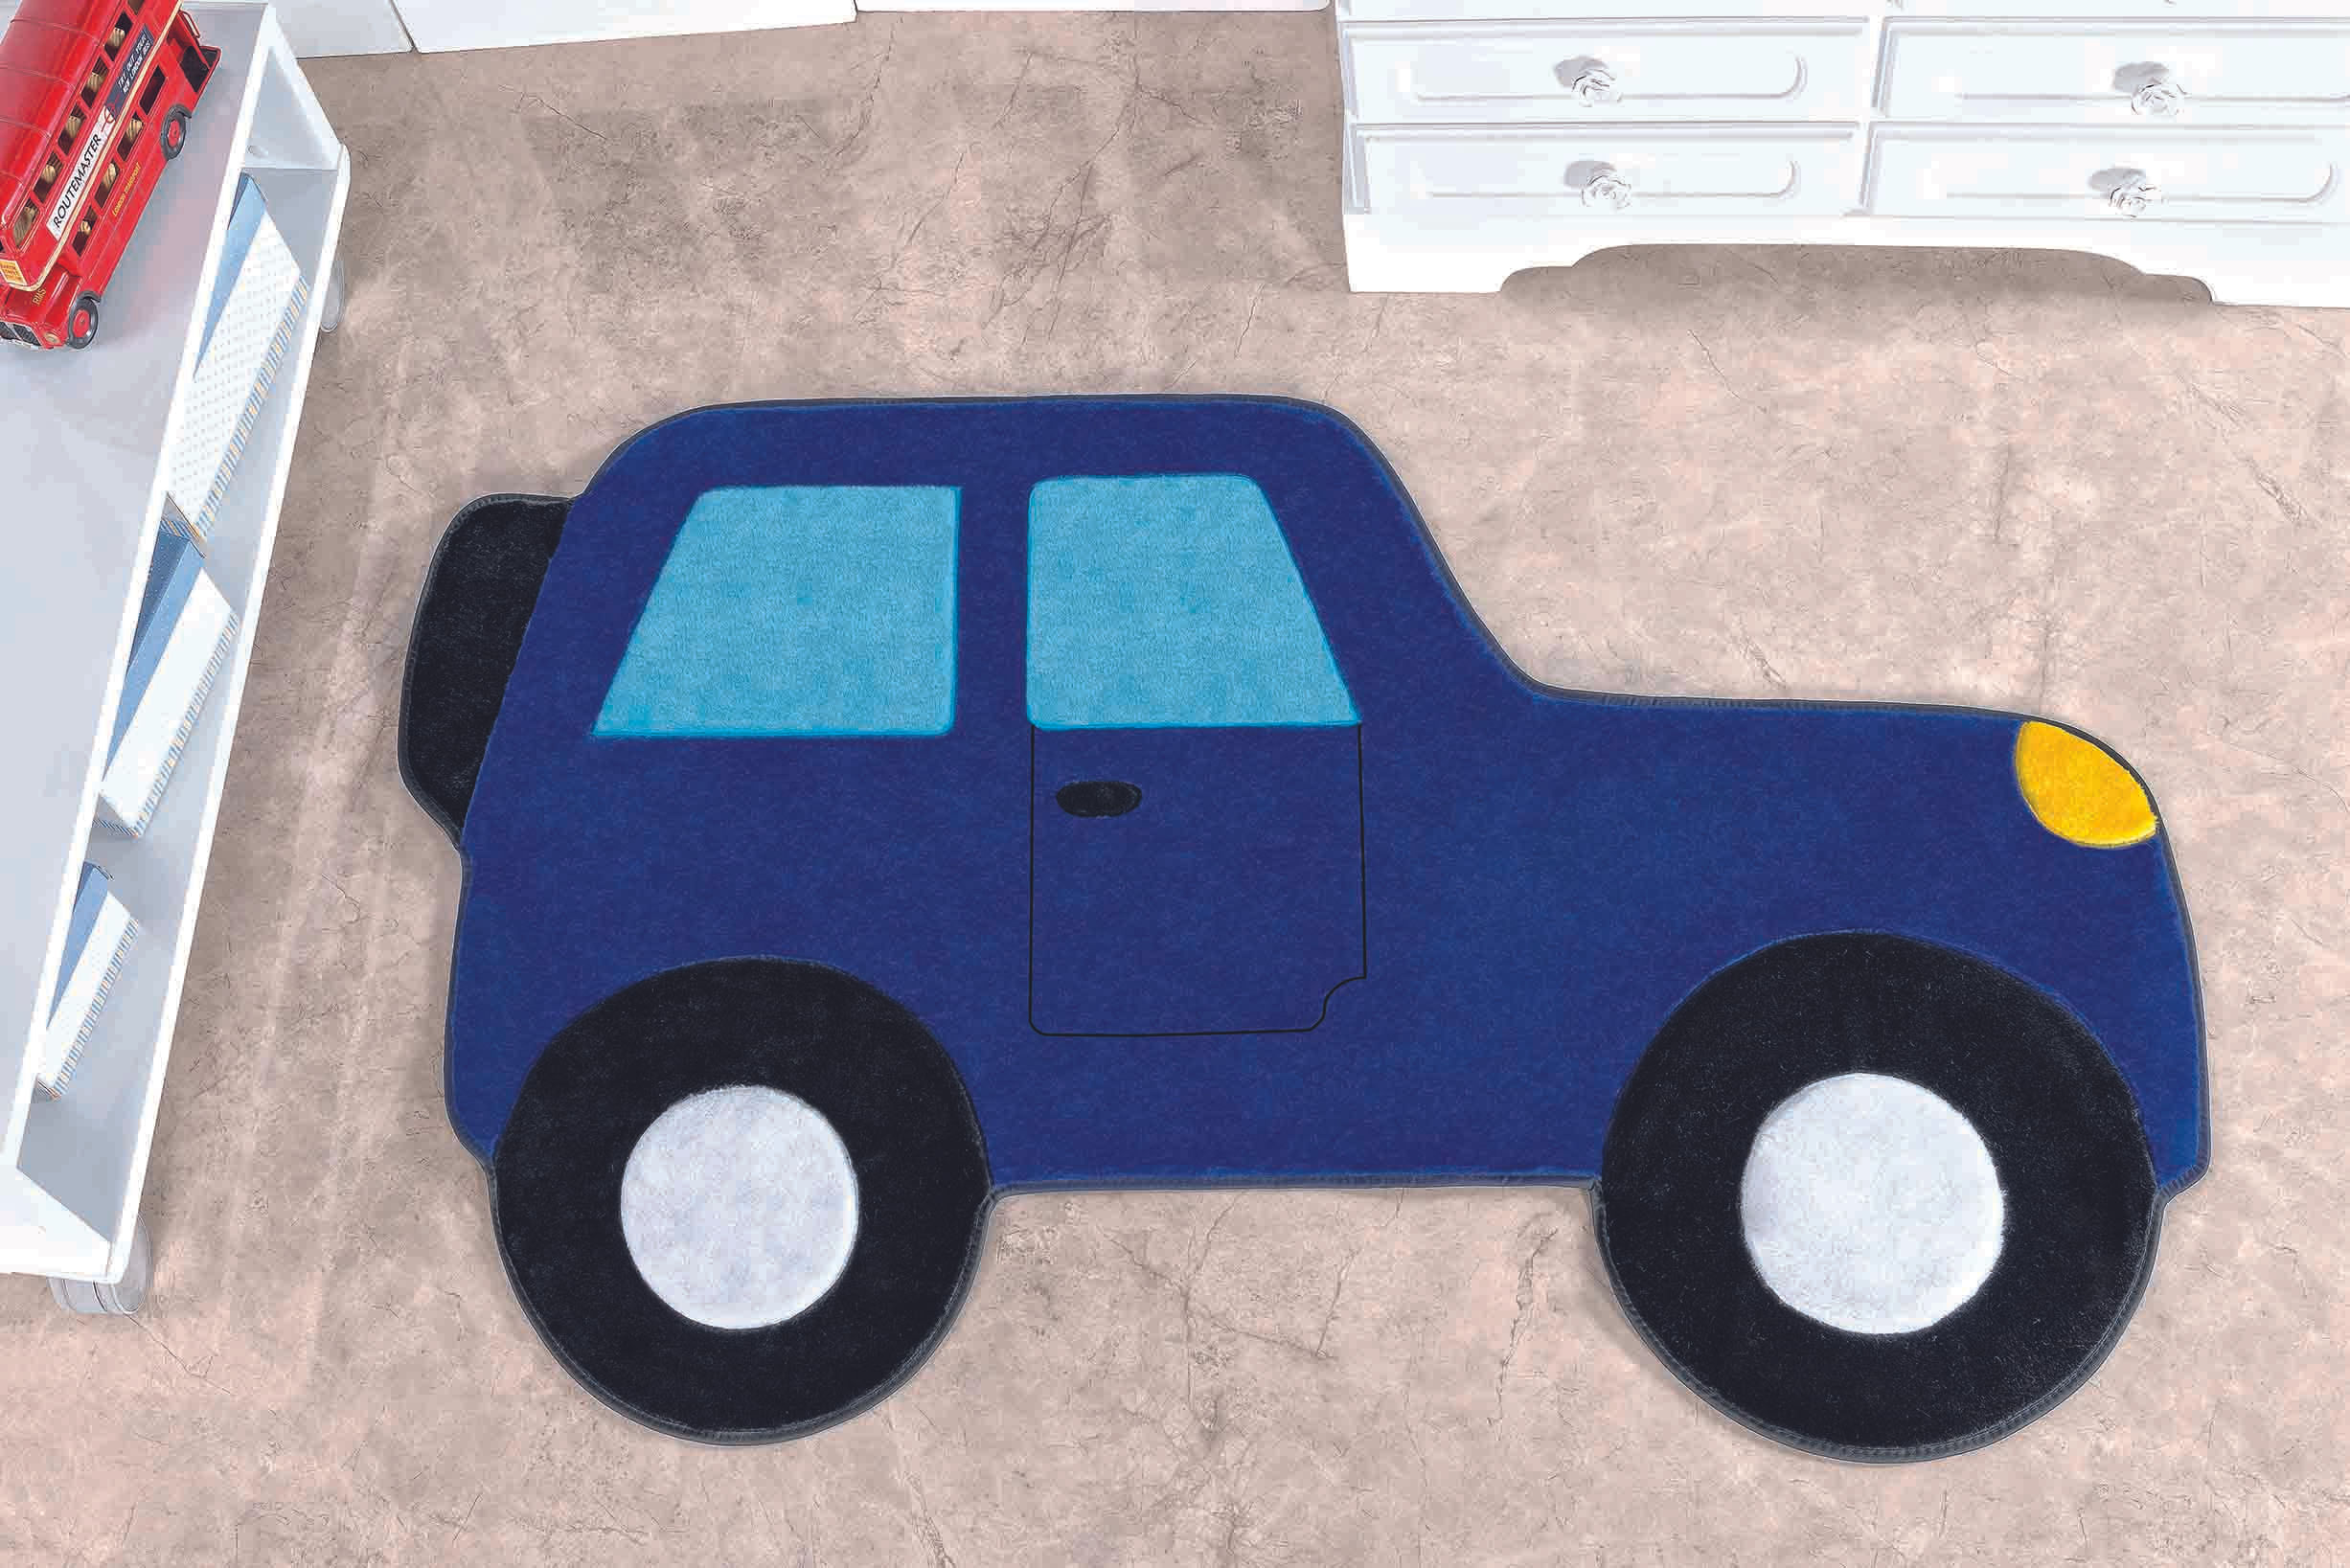 Tapete Premium Baby Carro Aventura 88cm x 62cm Azul Royal Guga Tapetes